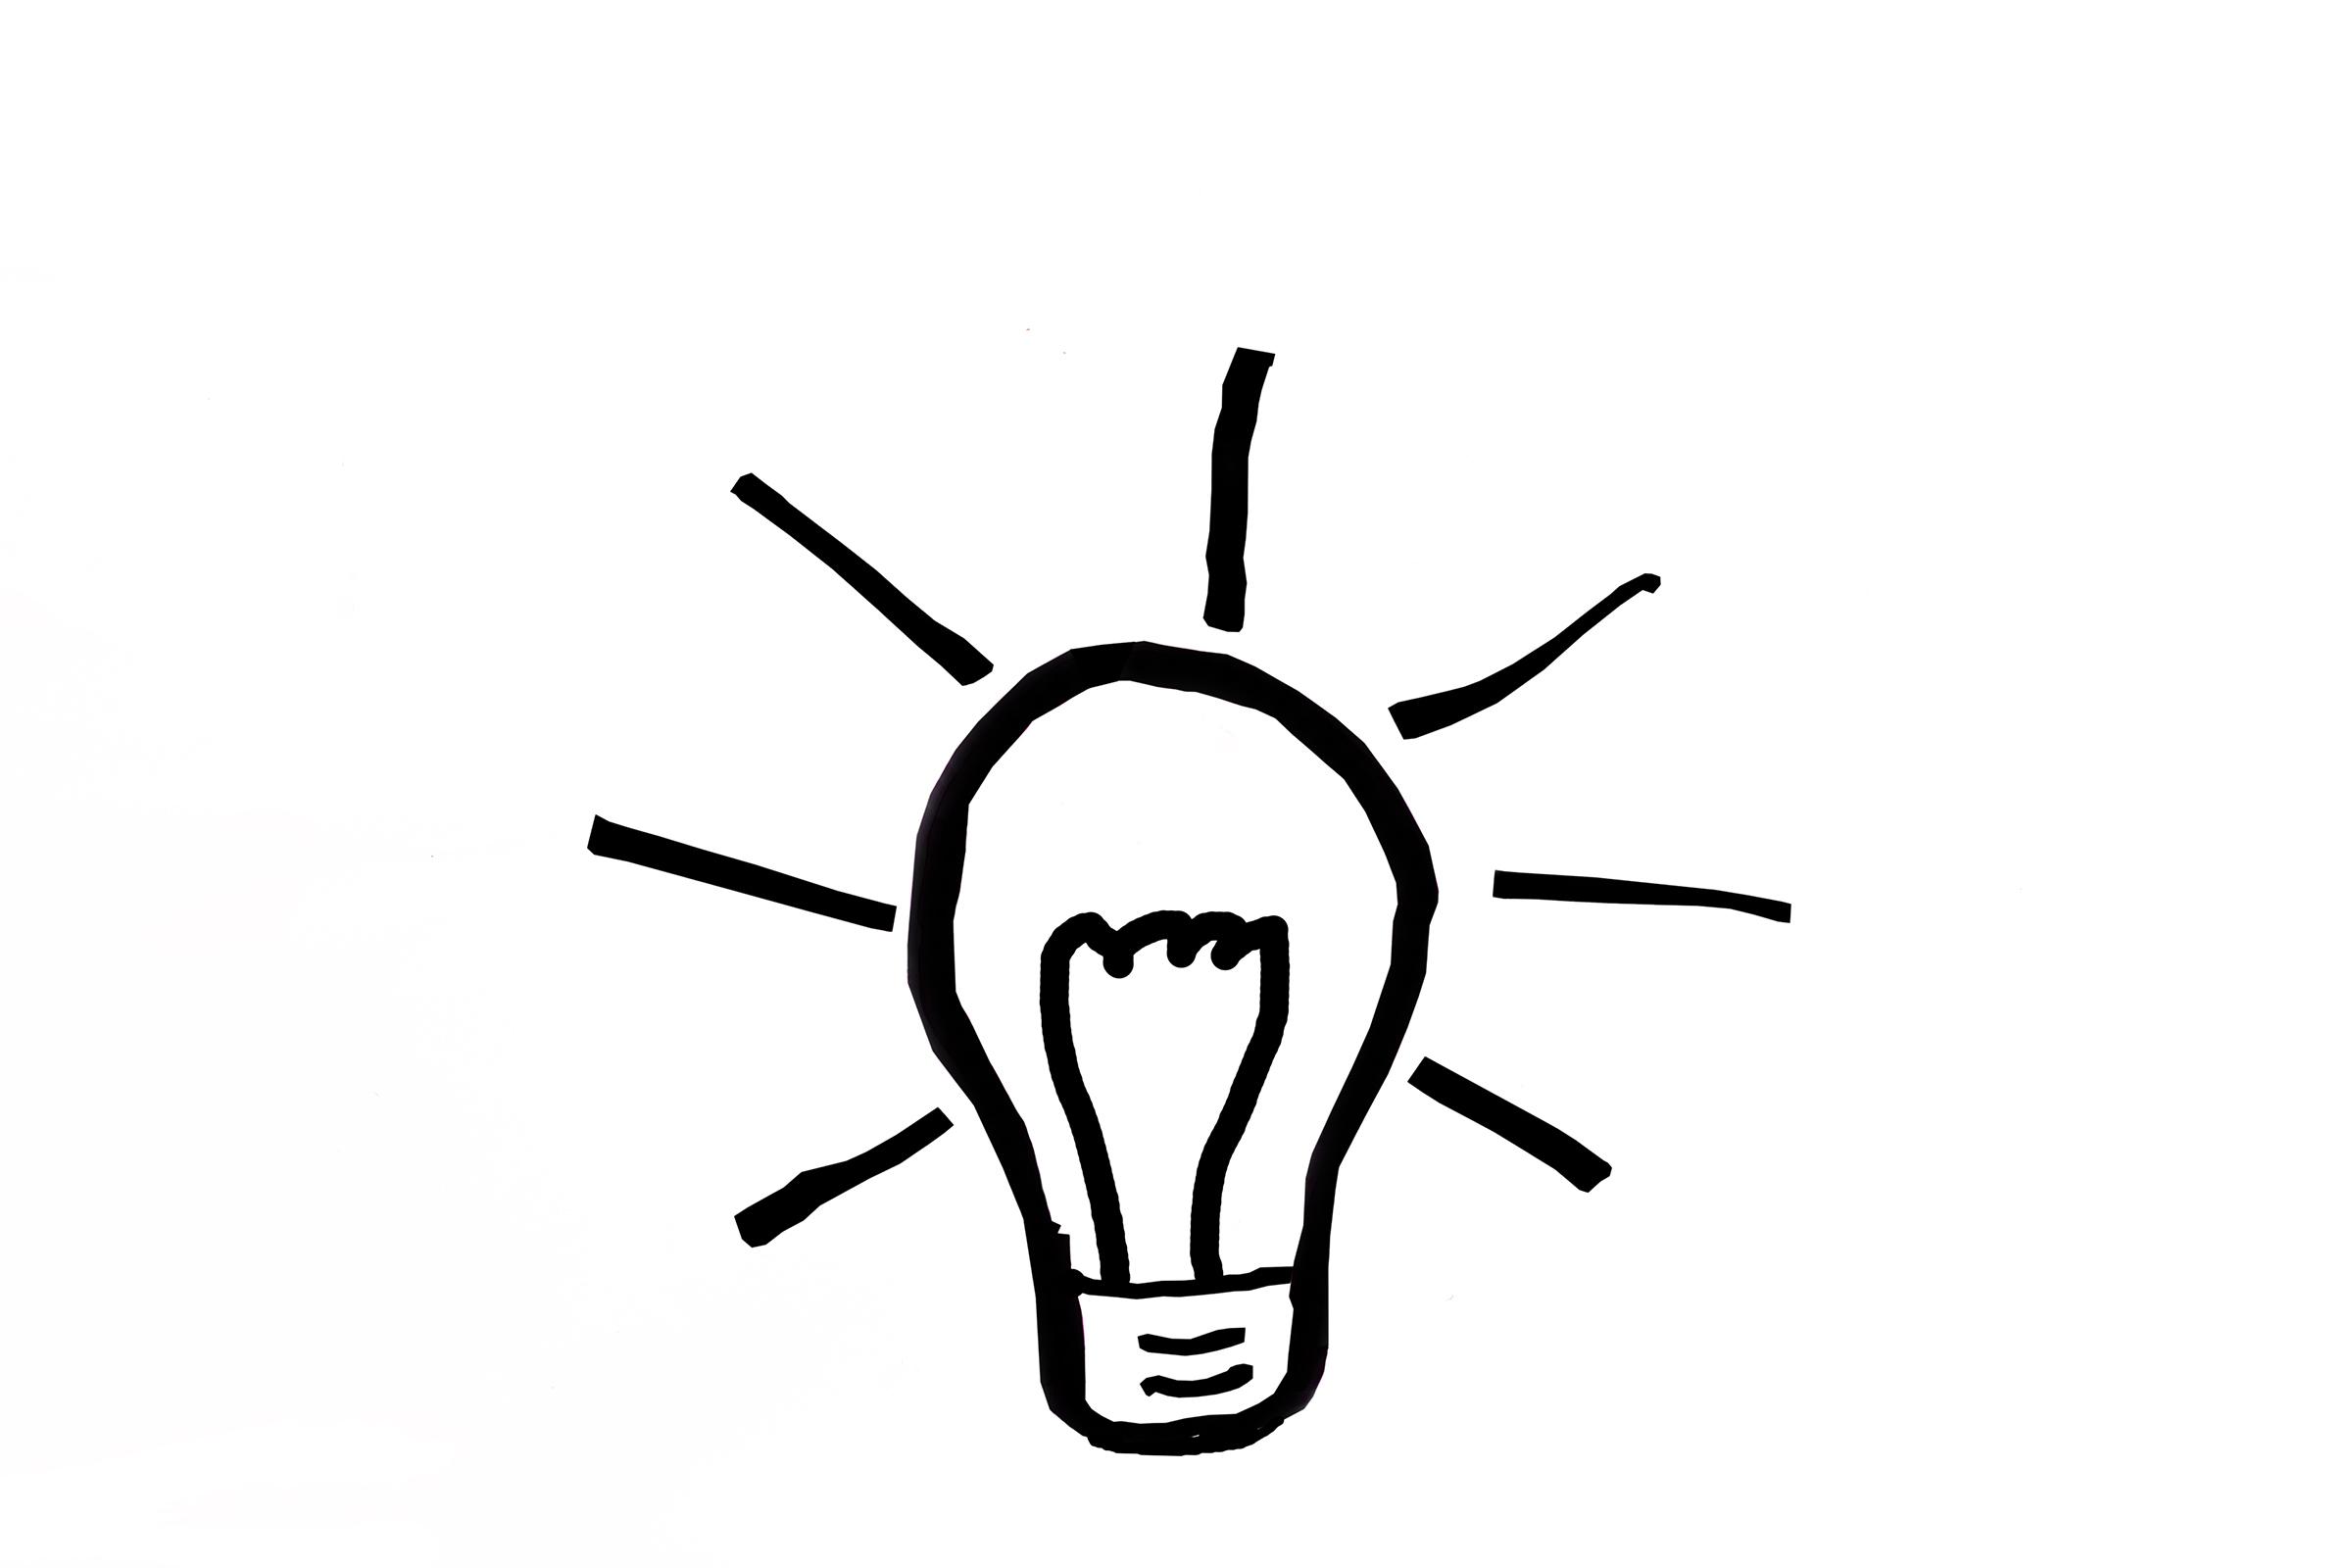 Concept, White, Lightbulb, Incandescent, Innovation, HQ Photo